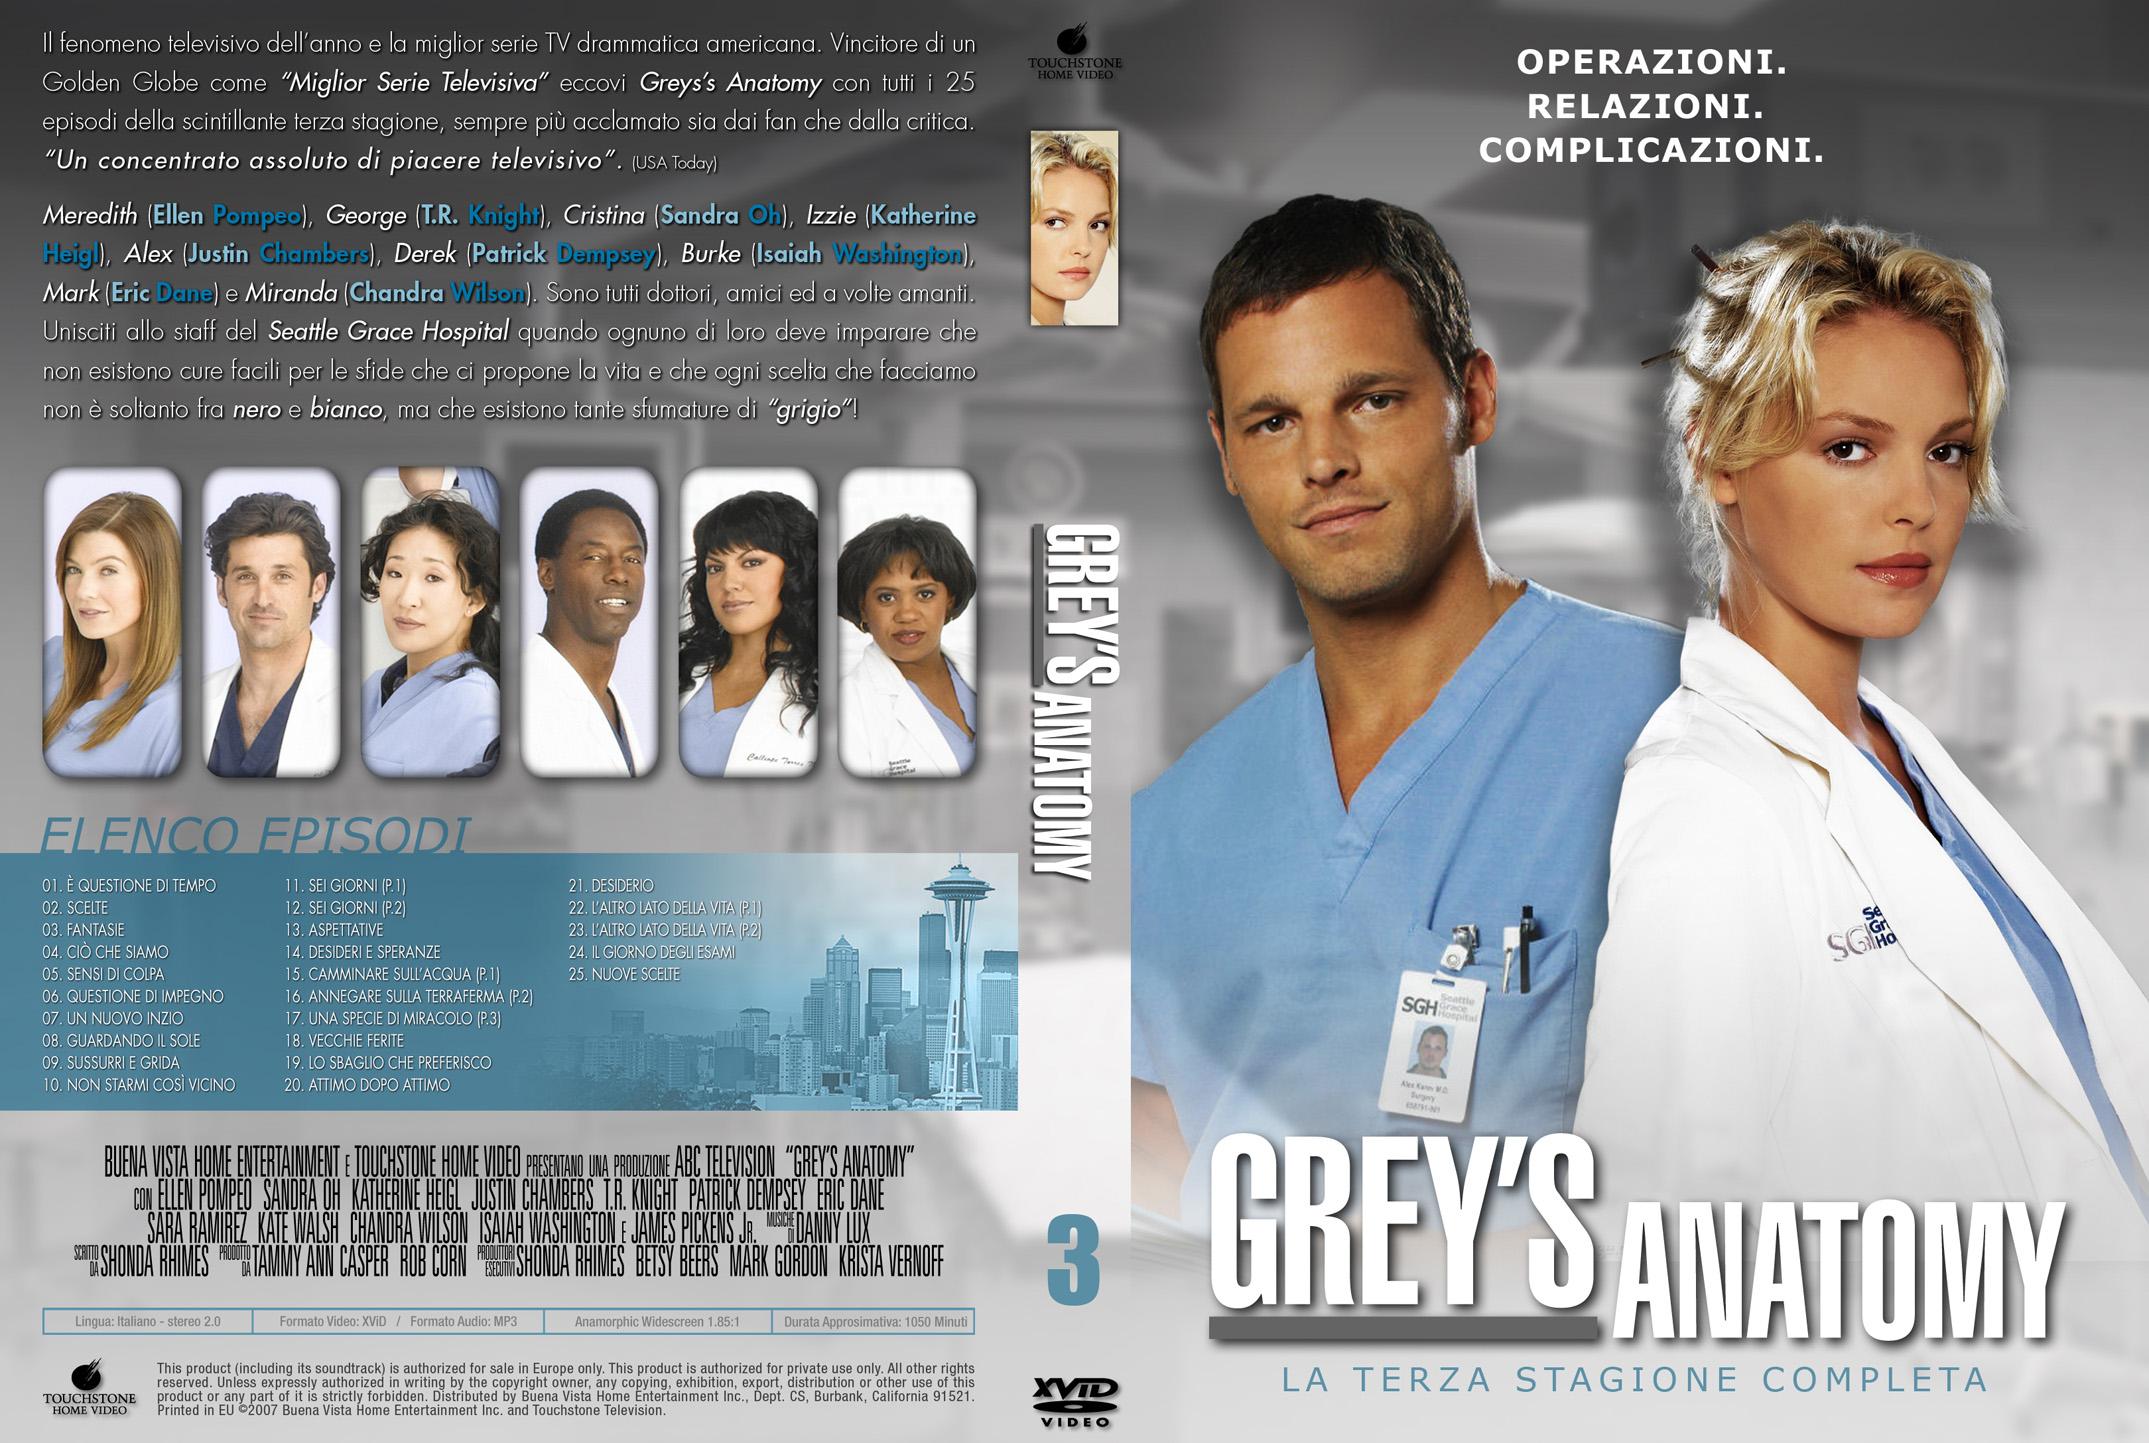 greys anatomy s13e12 subtitles